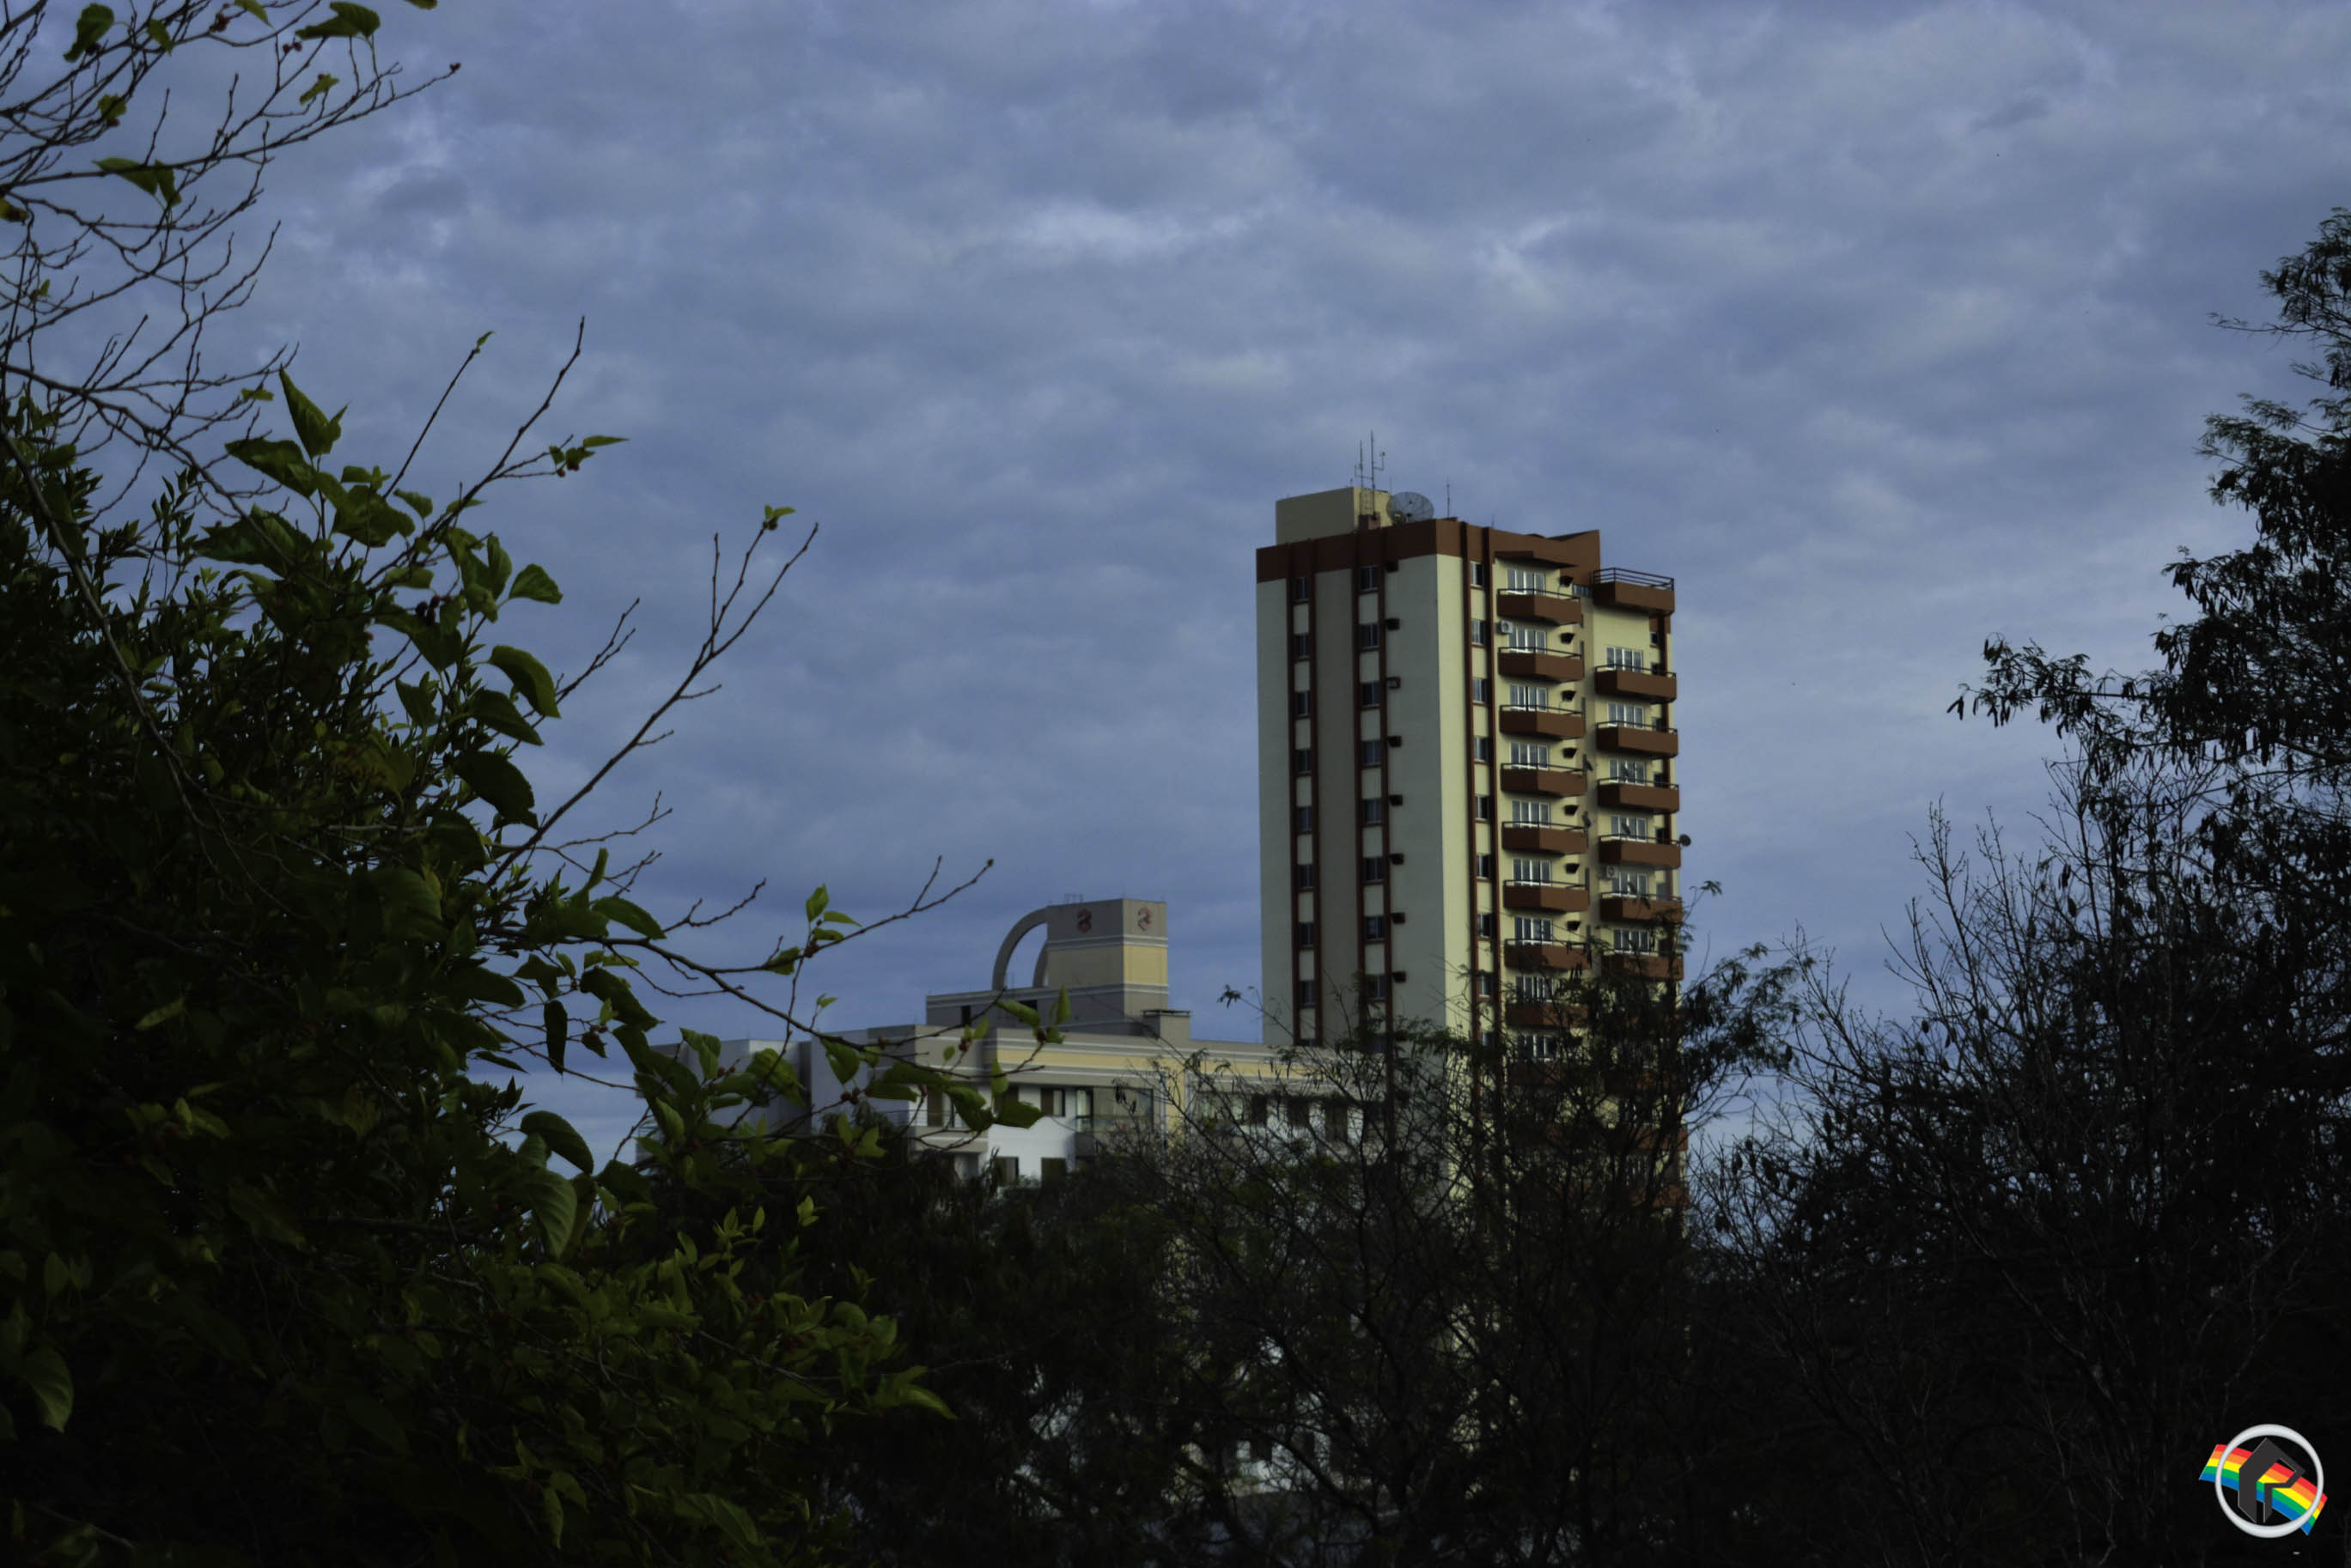 Santa Catarina terá uma montanha-russa de temperaturas